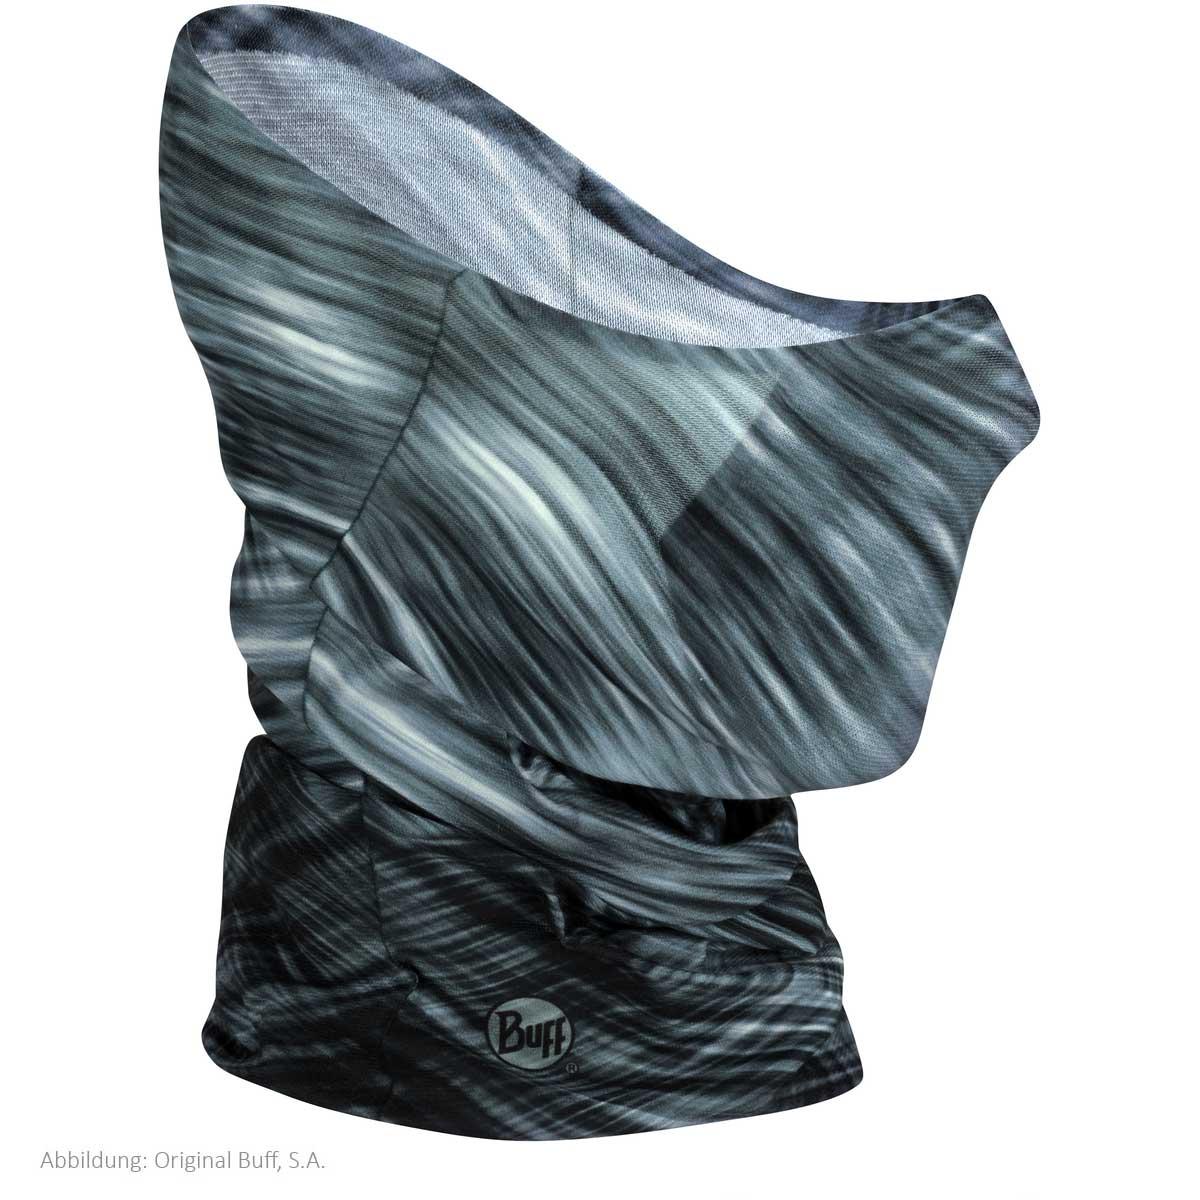 Image of Buff® Filter Tube Facial Mask - Shoren Black